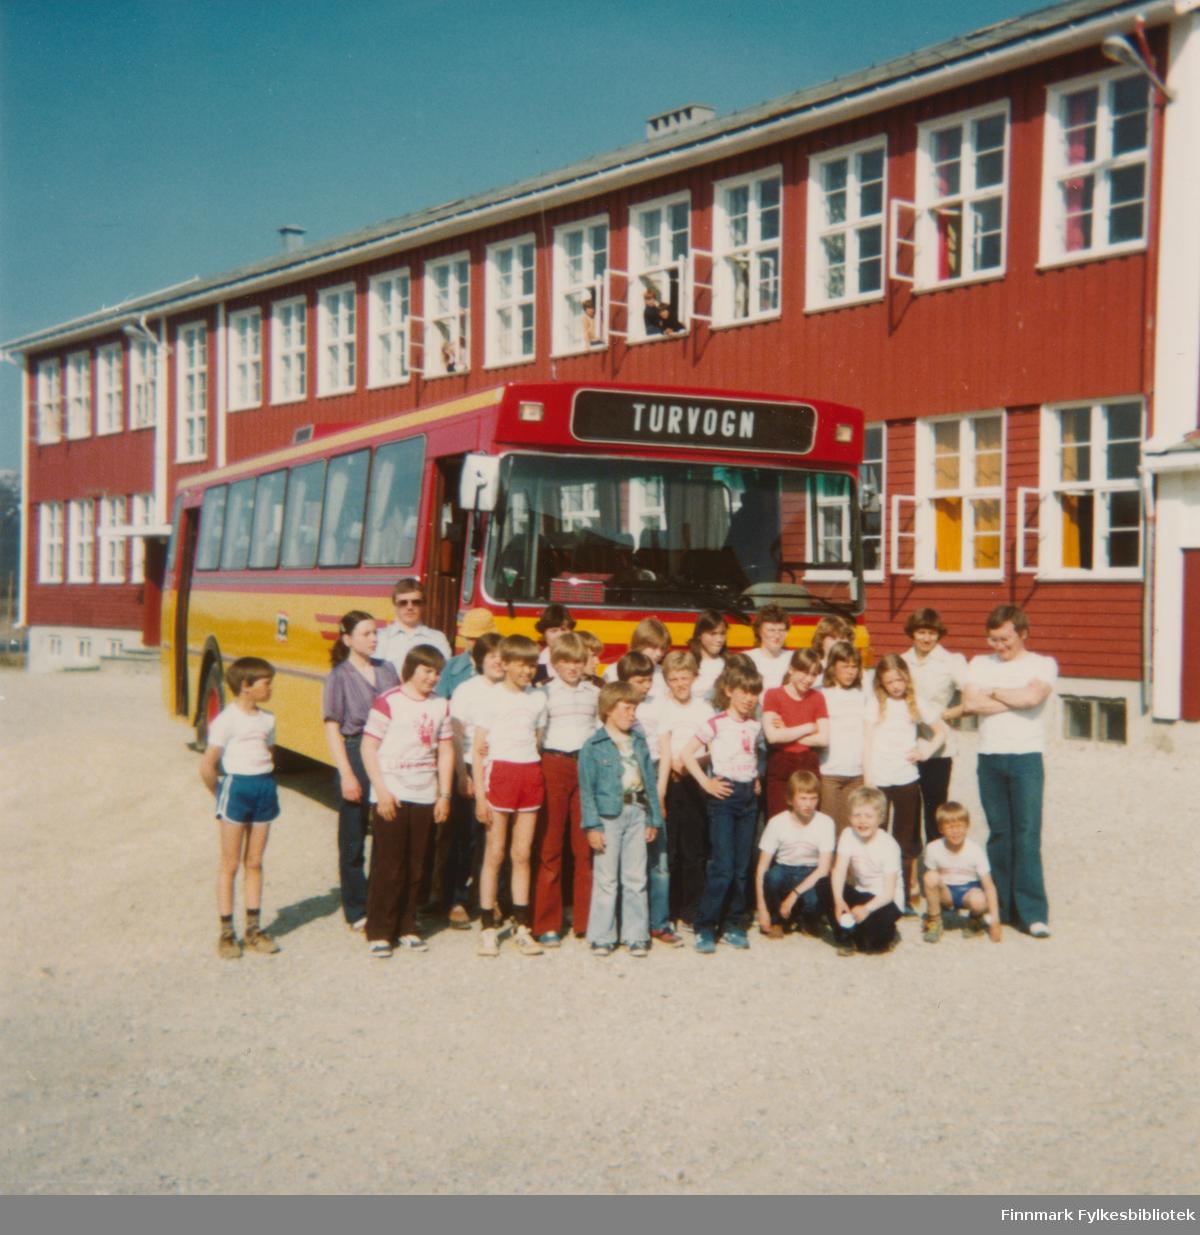 Elever i finsk ved Børselv skole. Lærer Terje Aronsen til høyre. Tur til Rovaniemi med besøk på skoler og i private hjem.